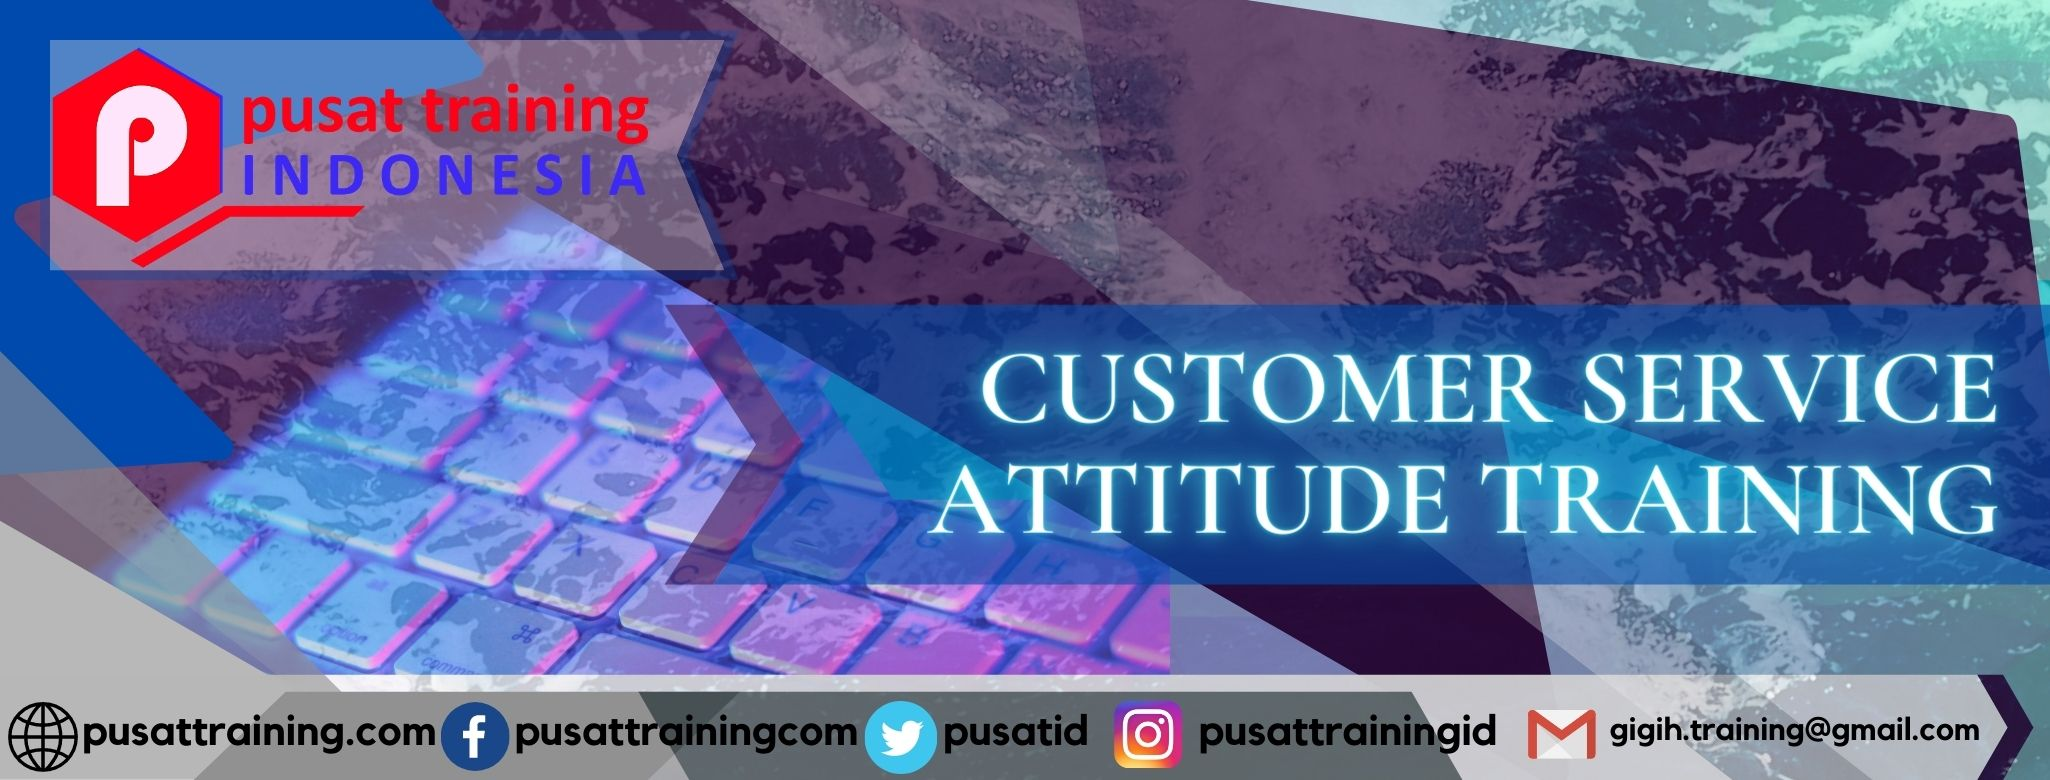 CUSTOMER SERVICE ATTITUDE TRAINING